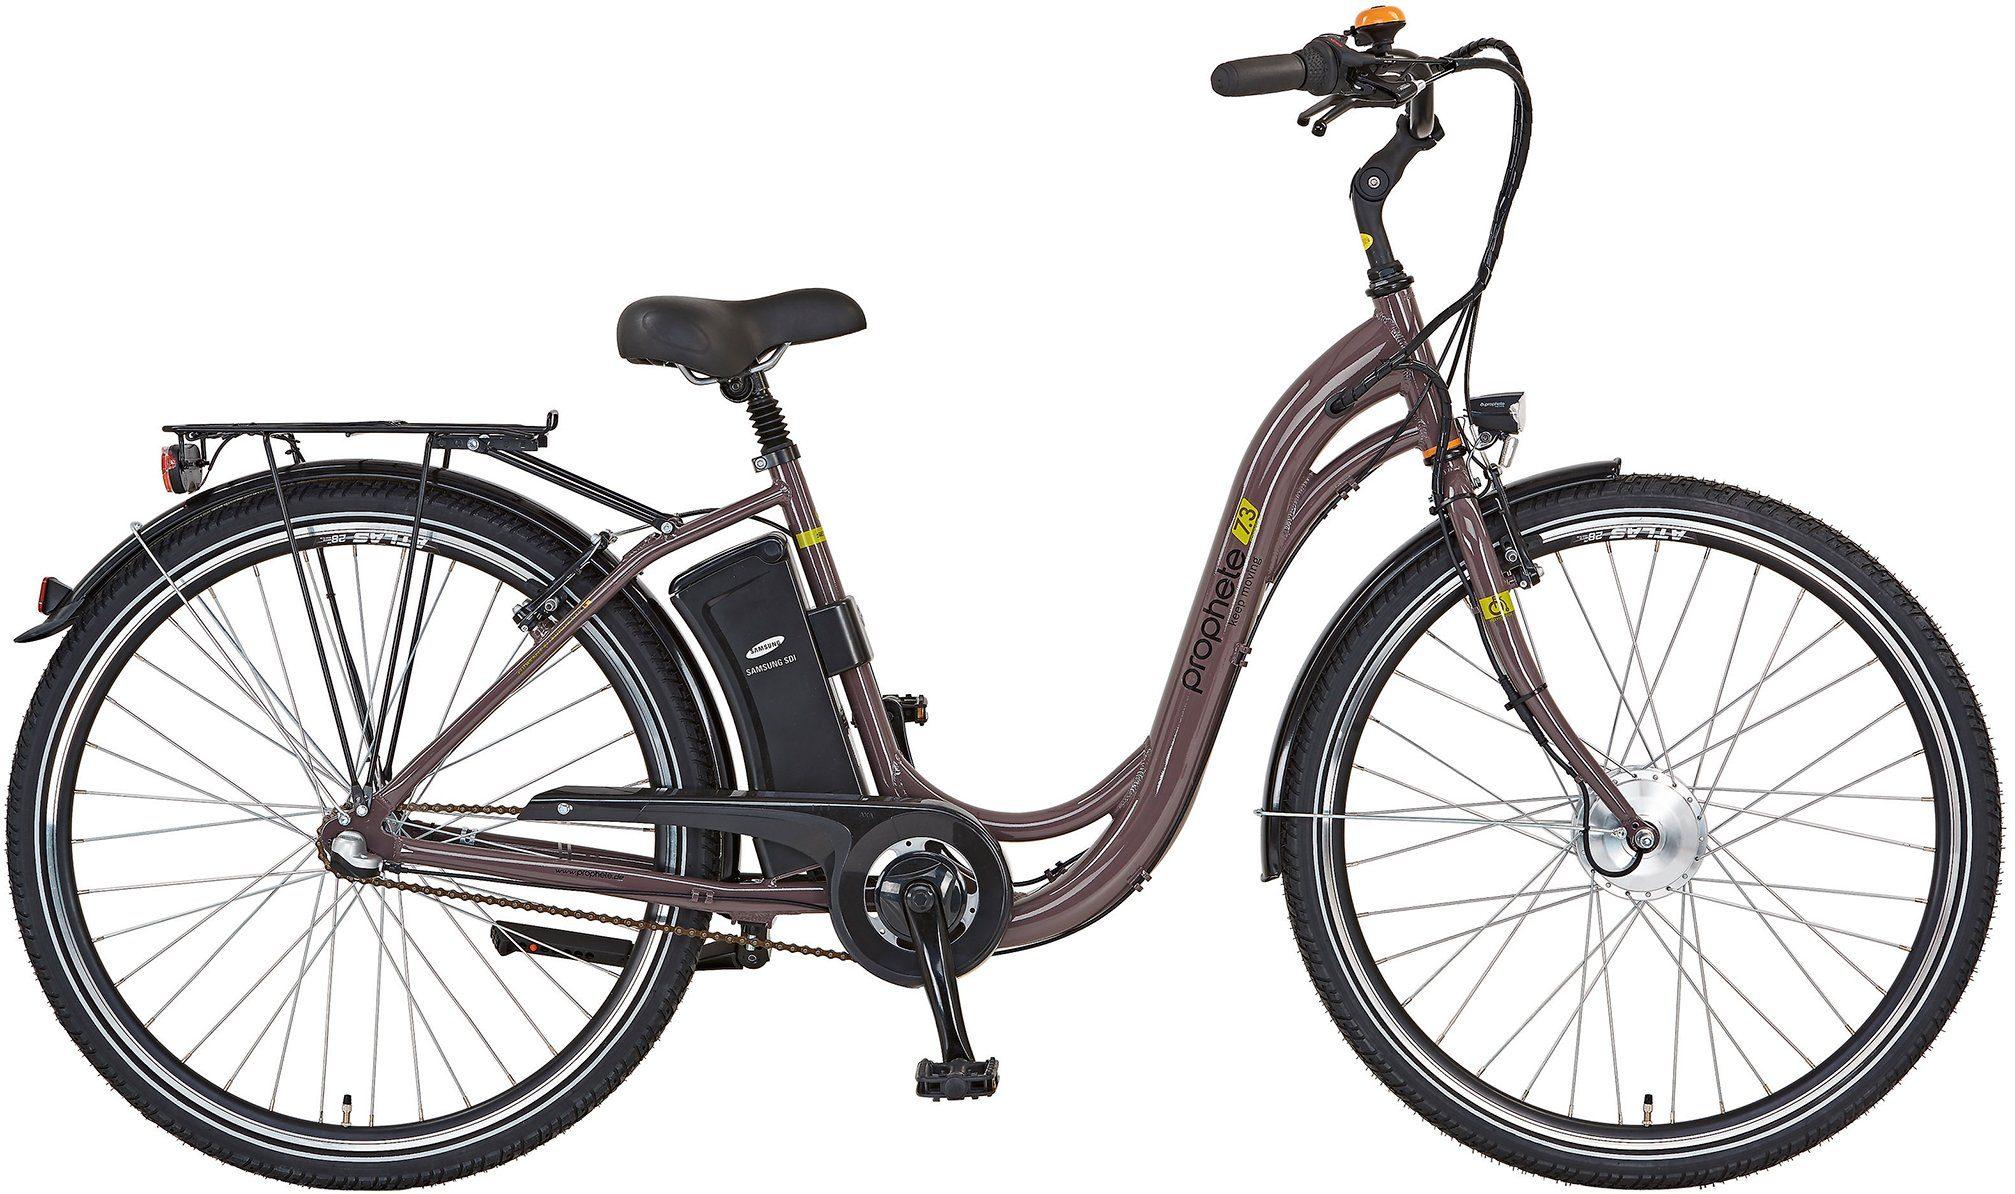 Prophete Damen E-Bike City, 28 Zoll, 3 Gang Shimano, Vorderradmotor, 250 Watt, »Navigator 7.3«